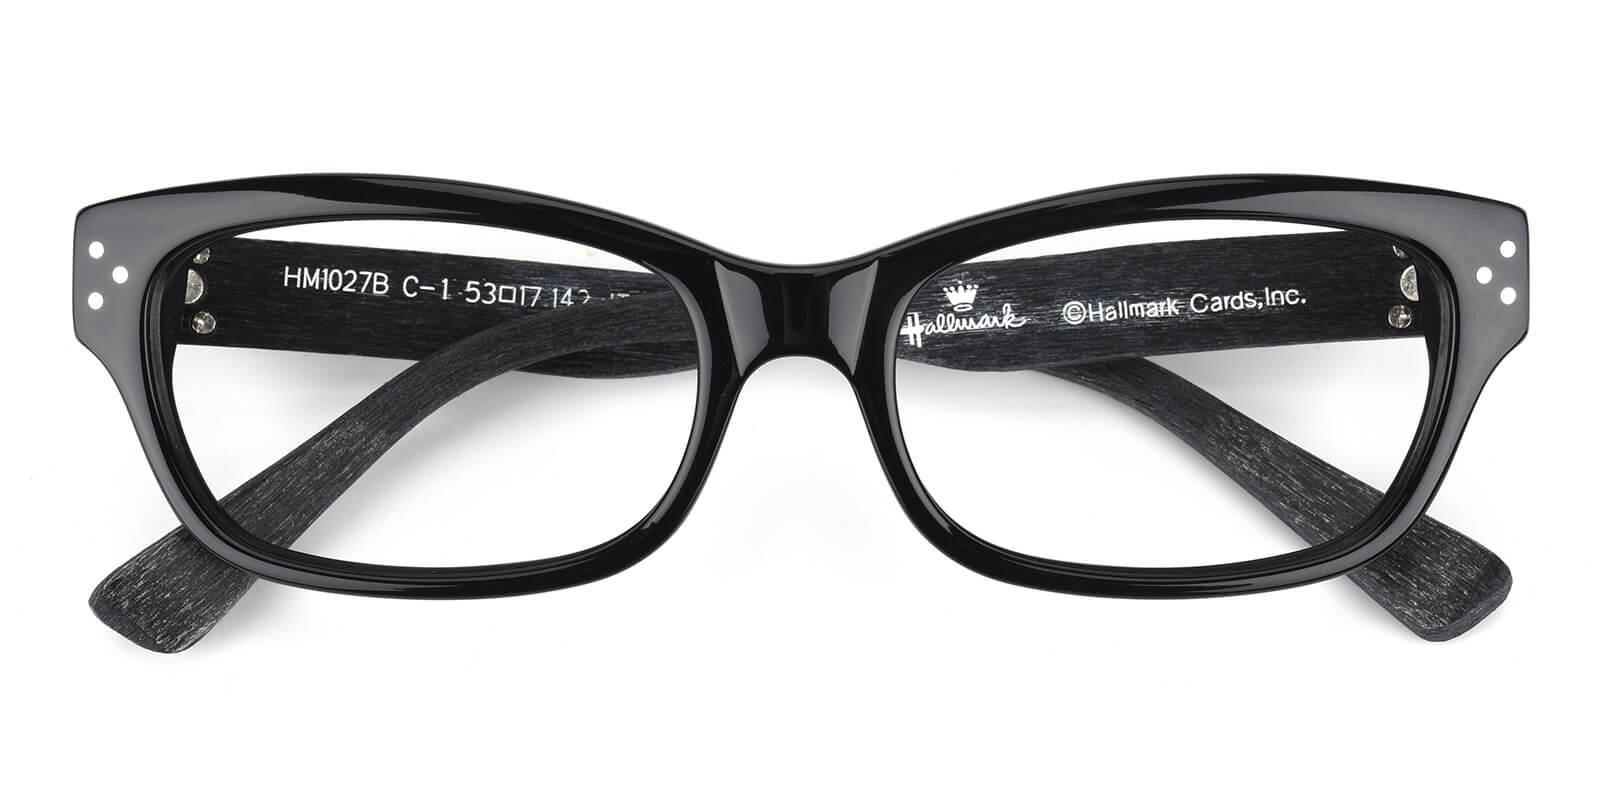 Flymingo-Black-Rectangle-Acetate-Eyeglasses-detail